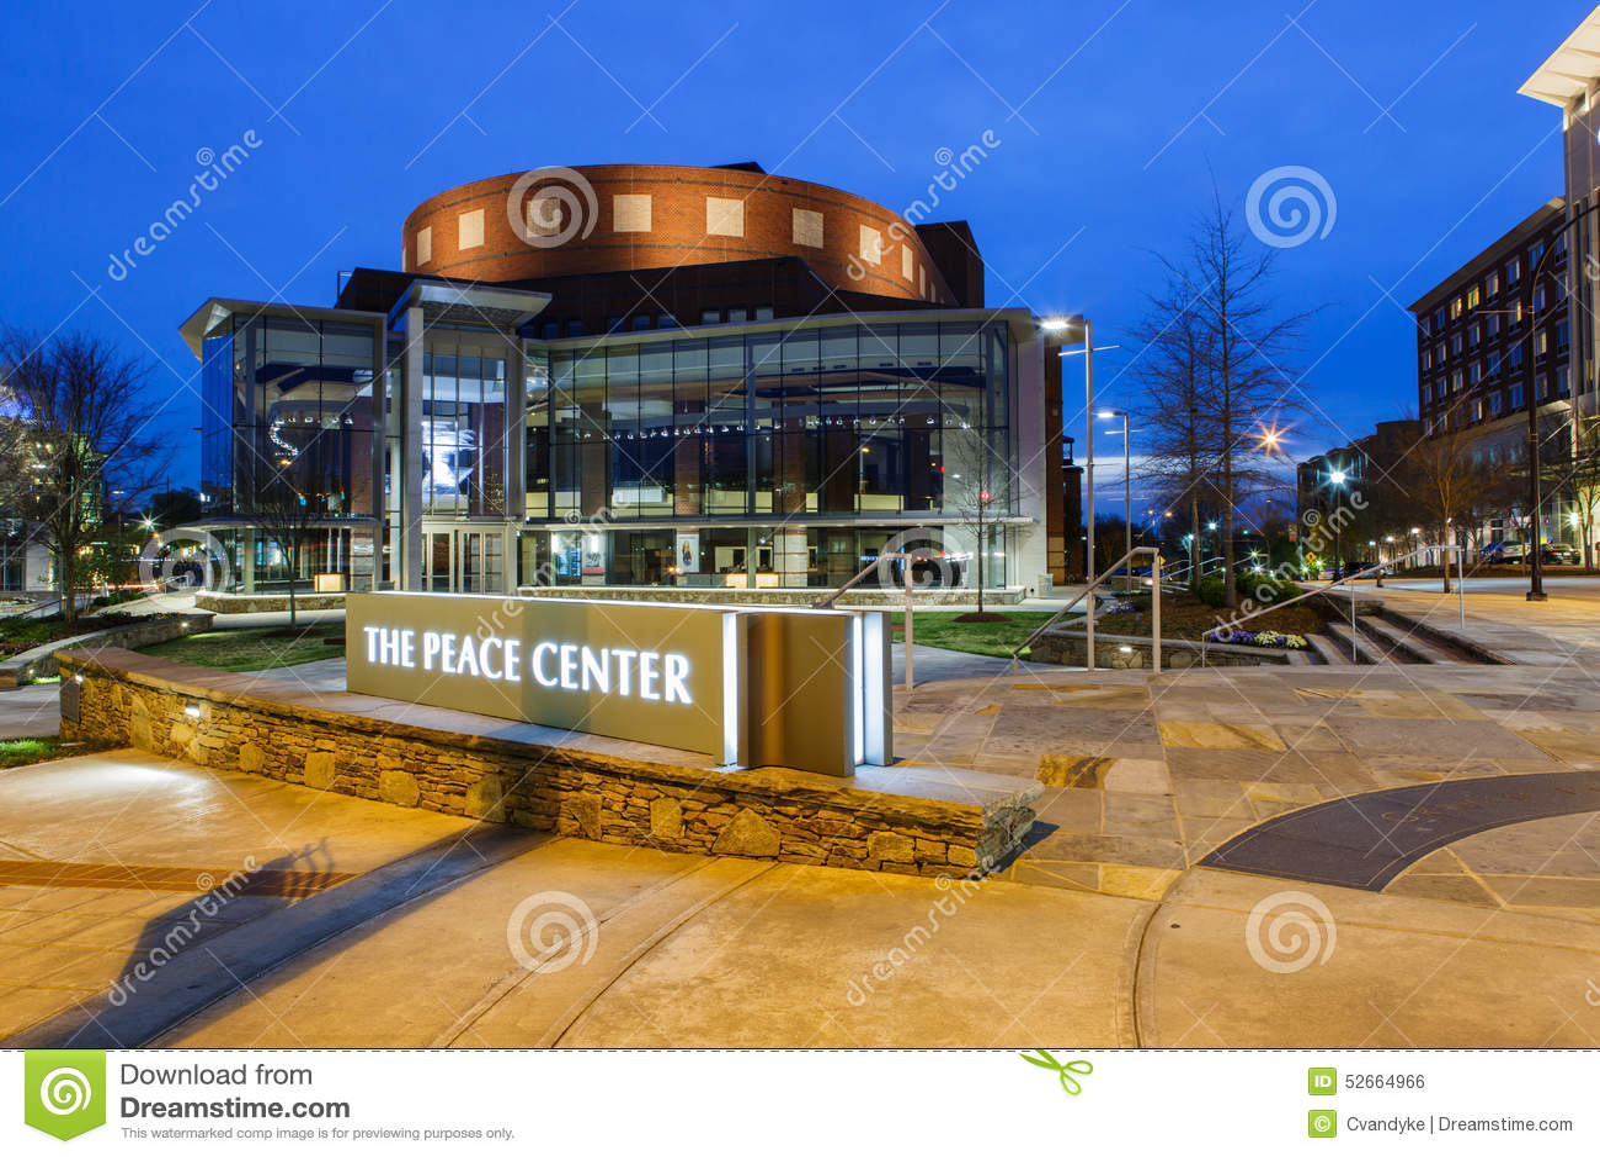 The Peace Center Greenville South Carolina Editorial Photo Image